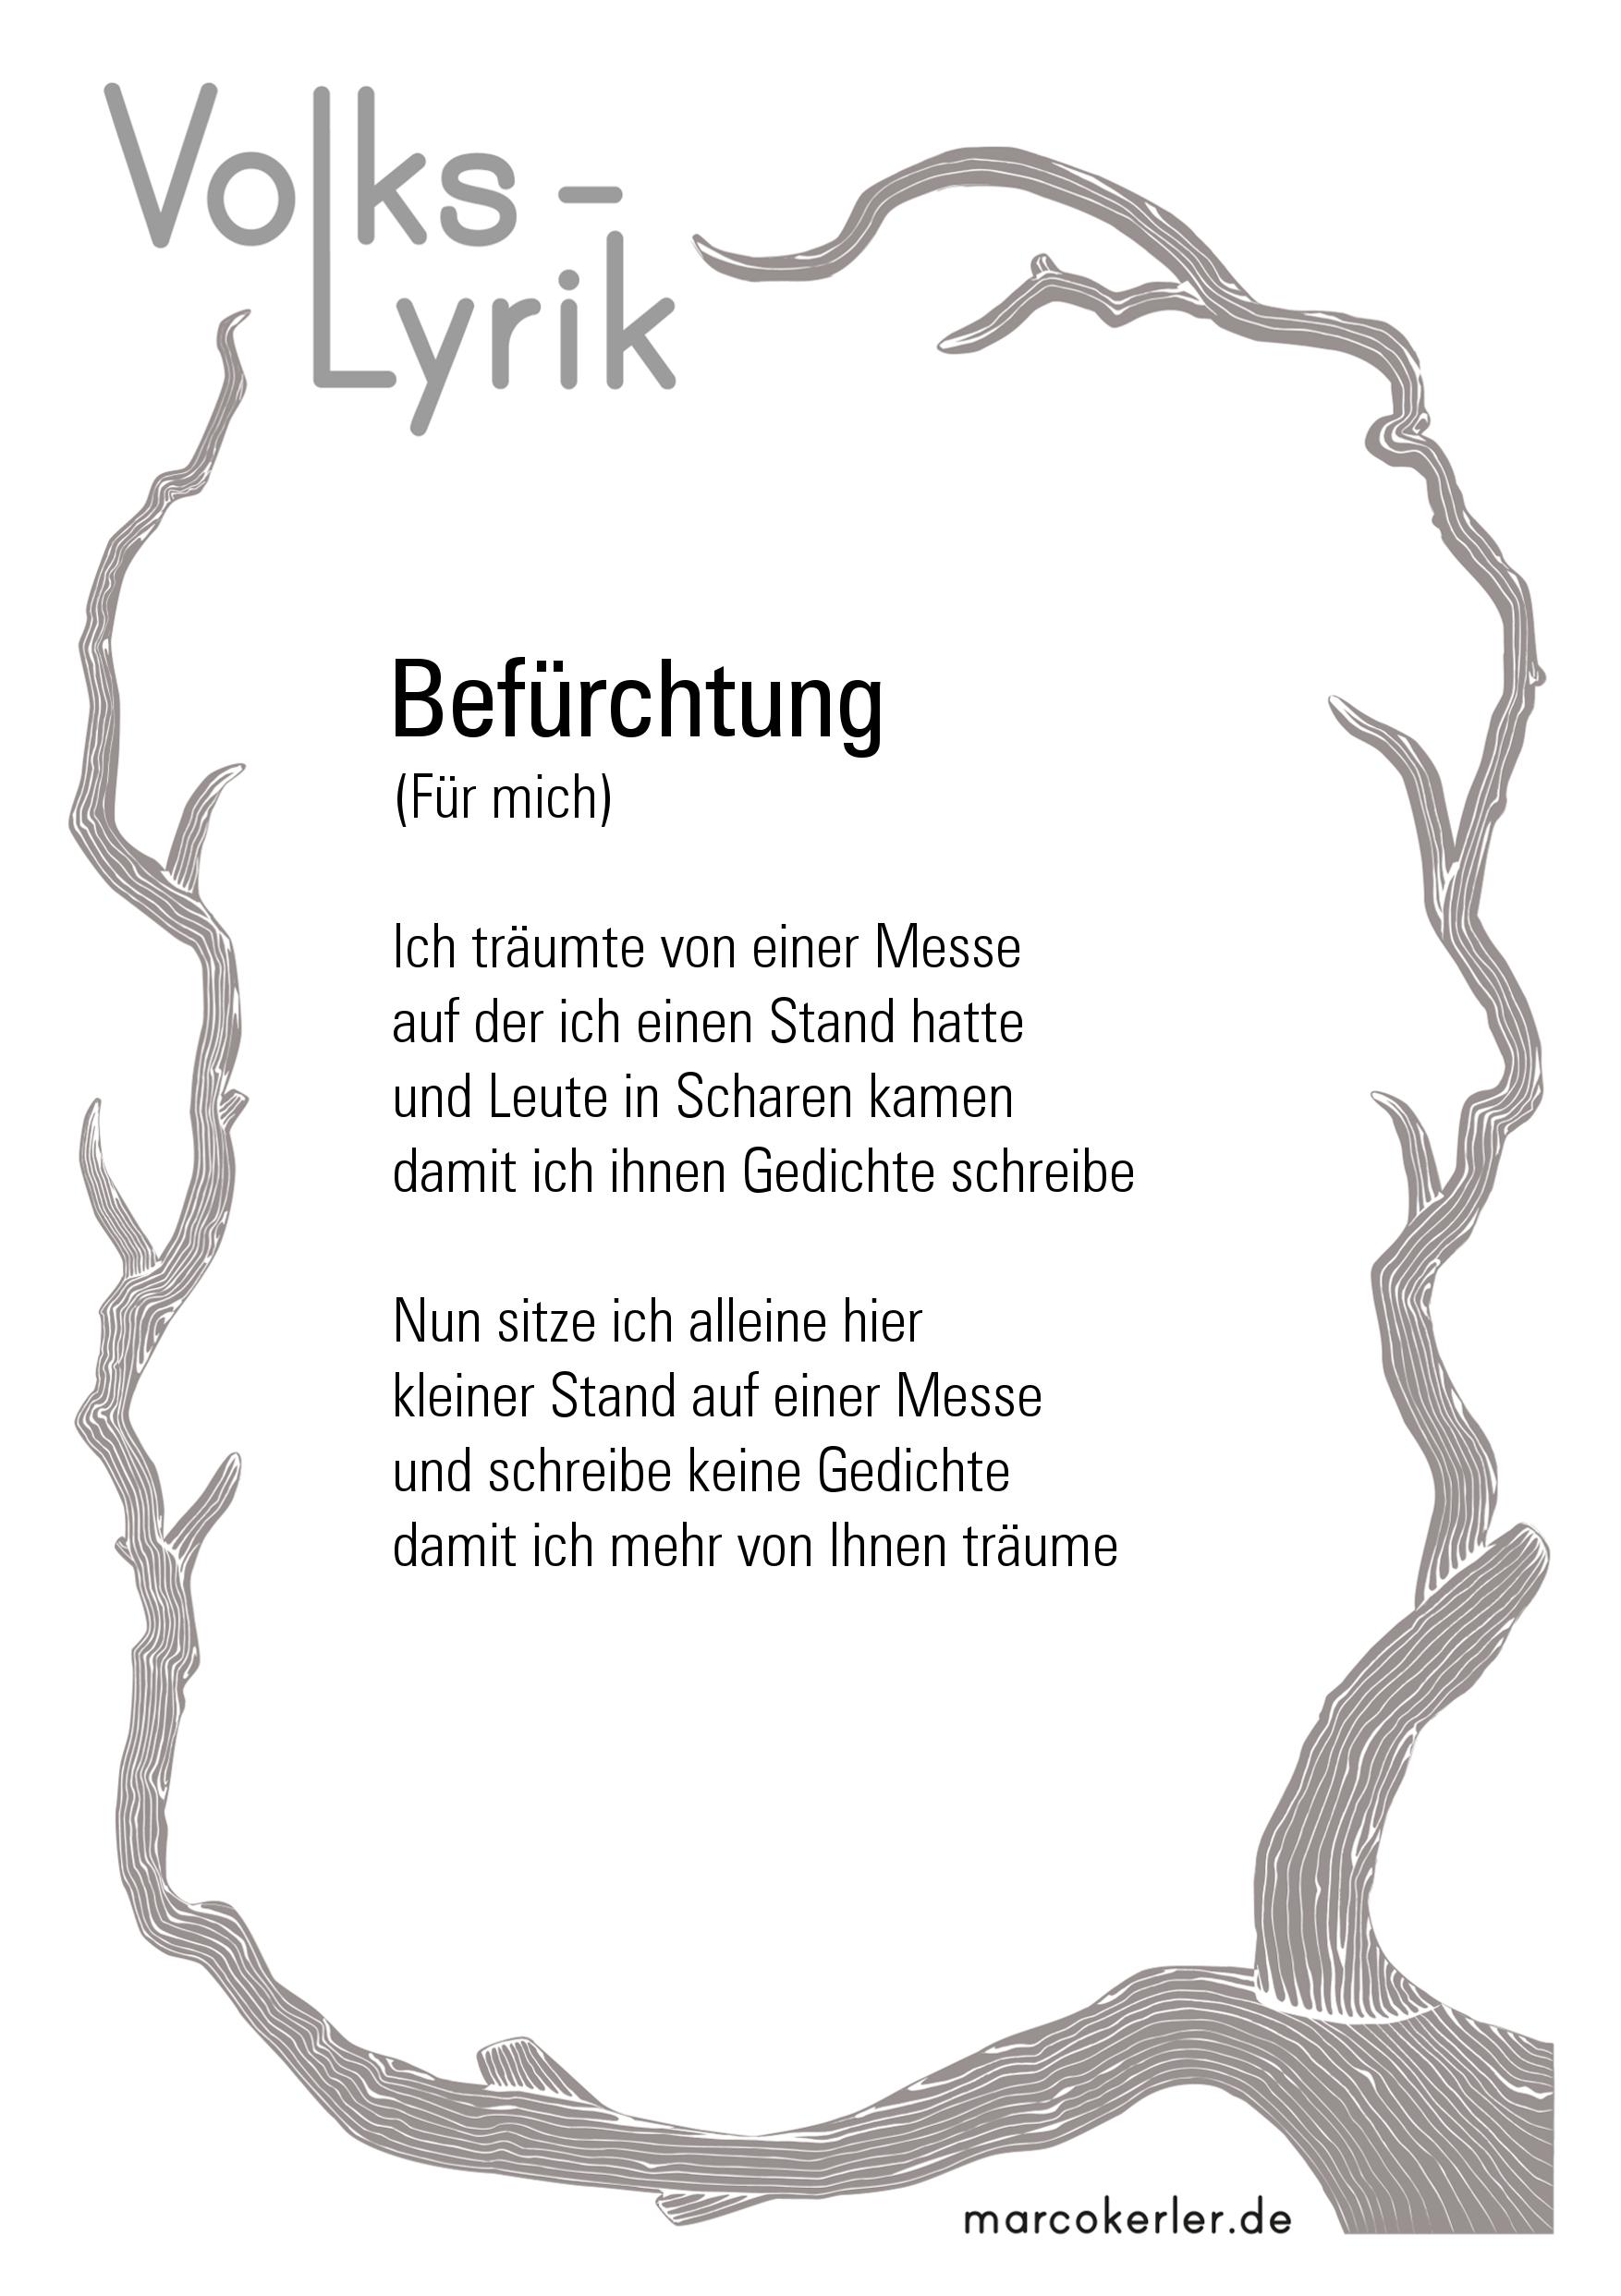 MarcoKerler_Volkslyrik_2